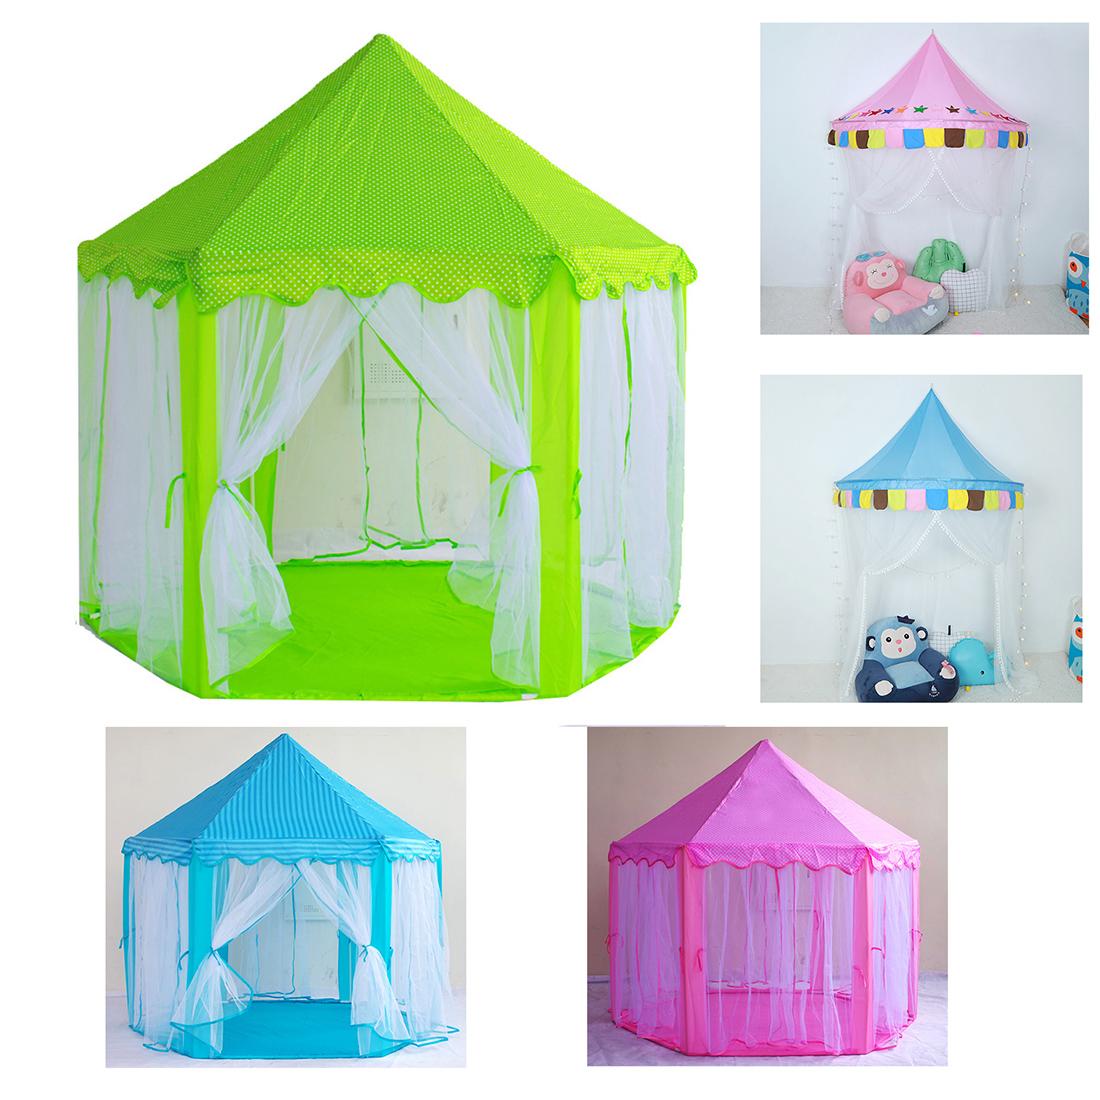 Details about Kids Baby Developmental Play Tent Children Girl Princess Indoor Castle Playhouse  sc 1 st  eBay & Kids Baby Developmental Play Tent Children Girl Princess Indoor ...